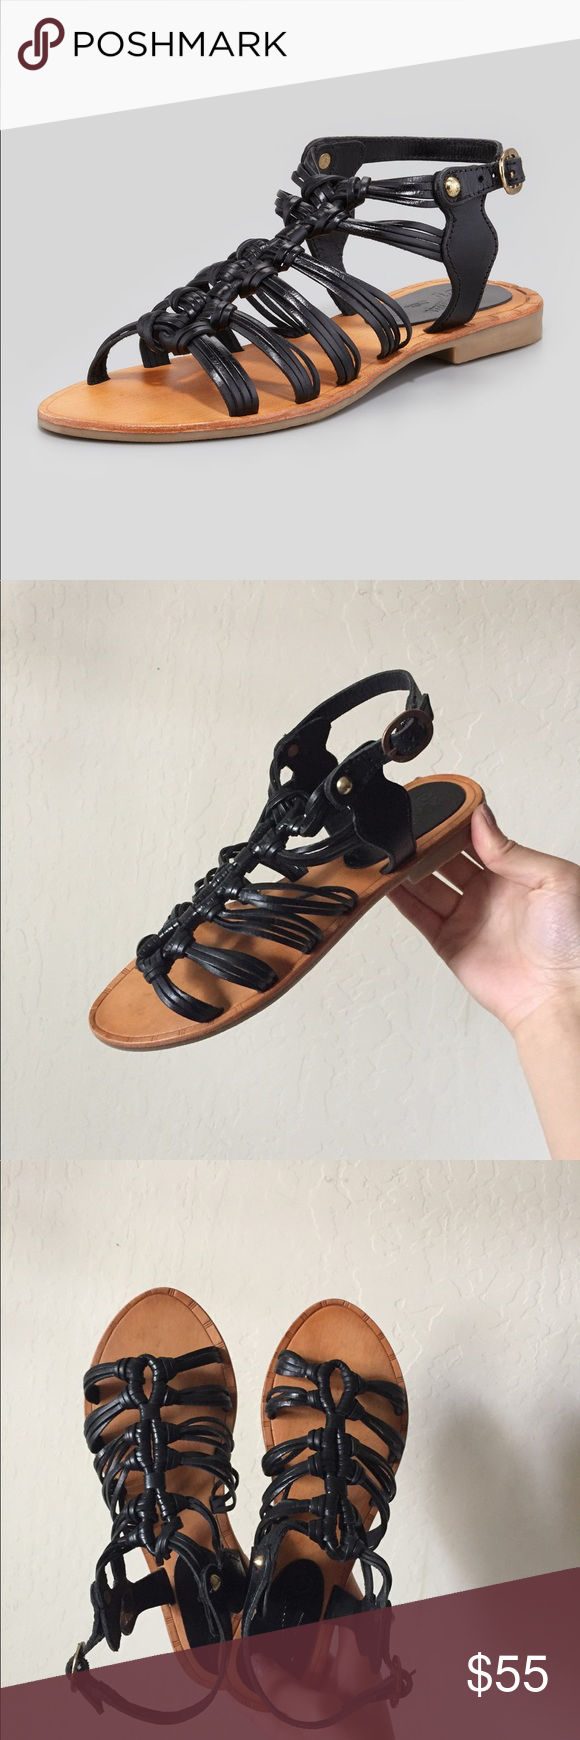 Nwot seychelles seychelles Nwot gladiator sandals   My Posh Picks   Pinterest   7a315a